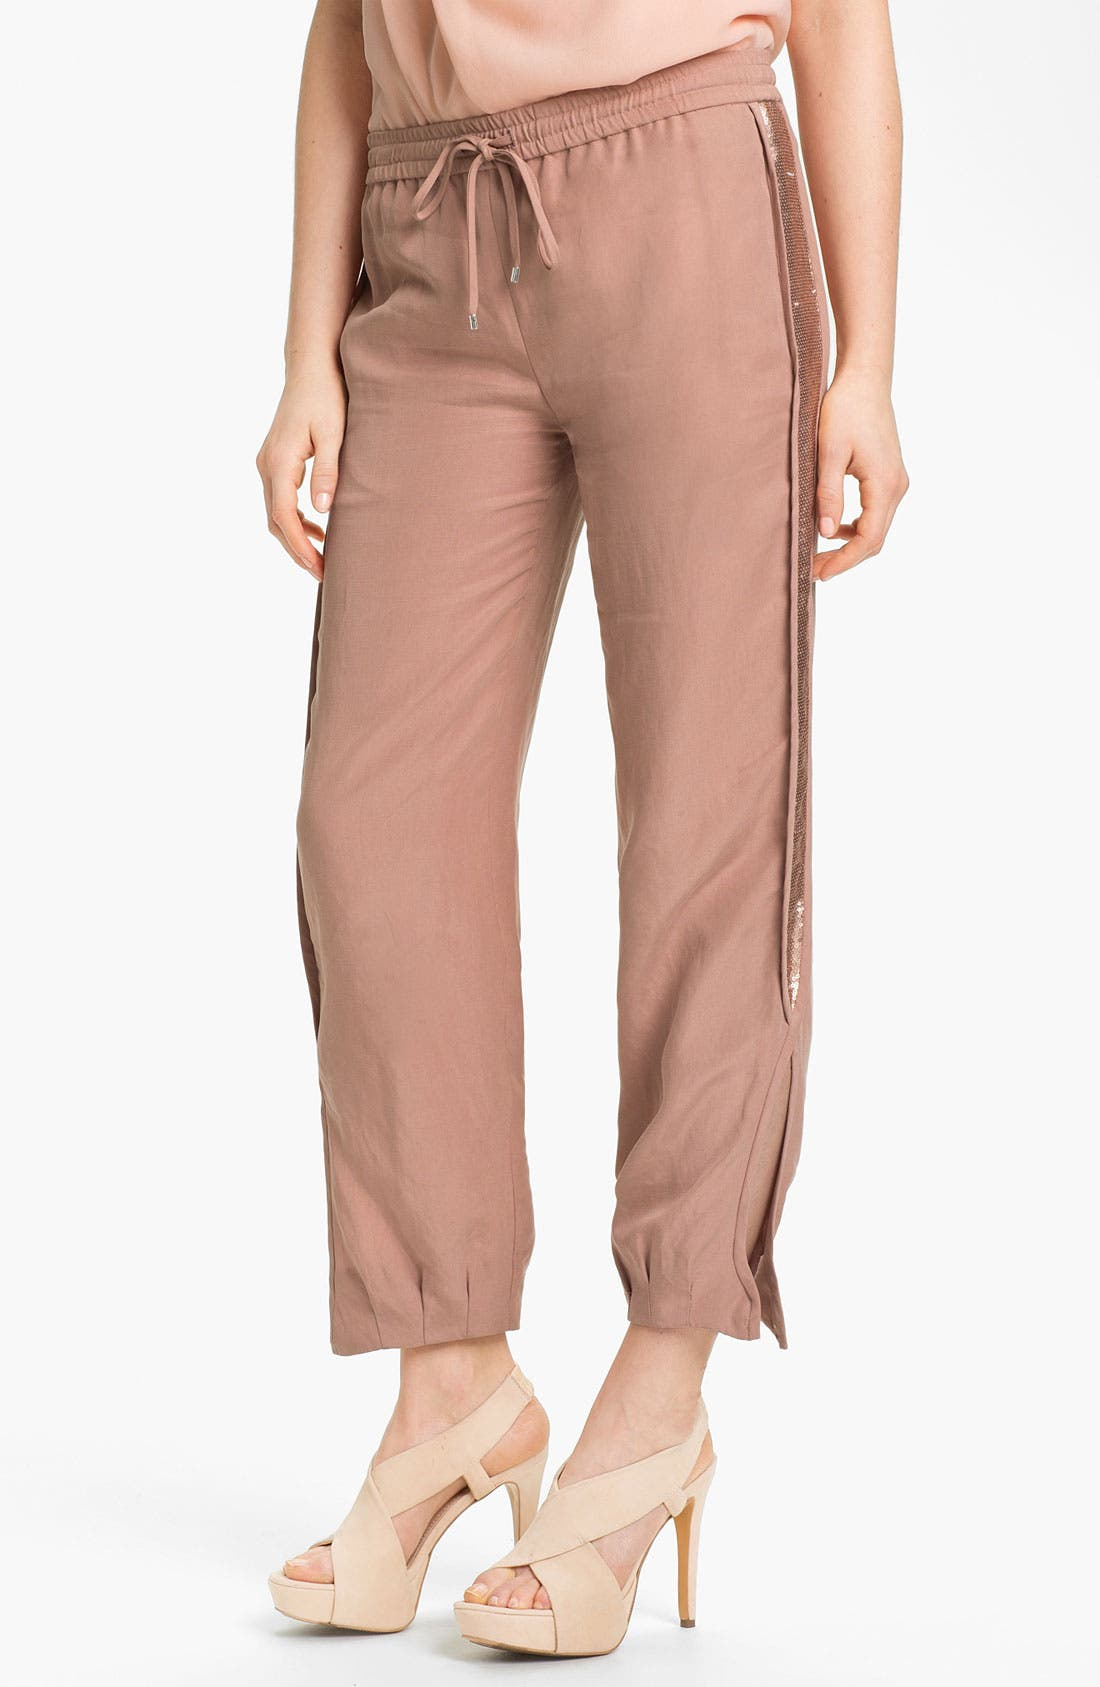 Alternate Image 1 Selected - Diane von Furstenberg 'Kamaris' Sequin Tuxedo Stripe Pants